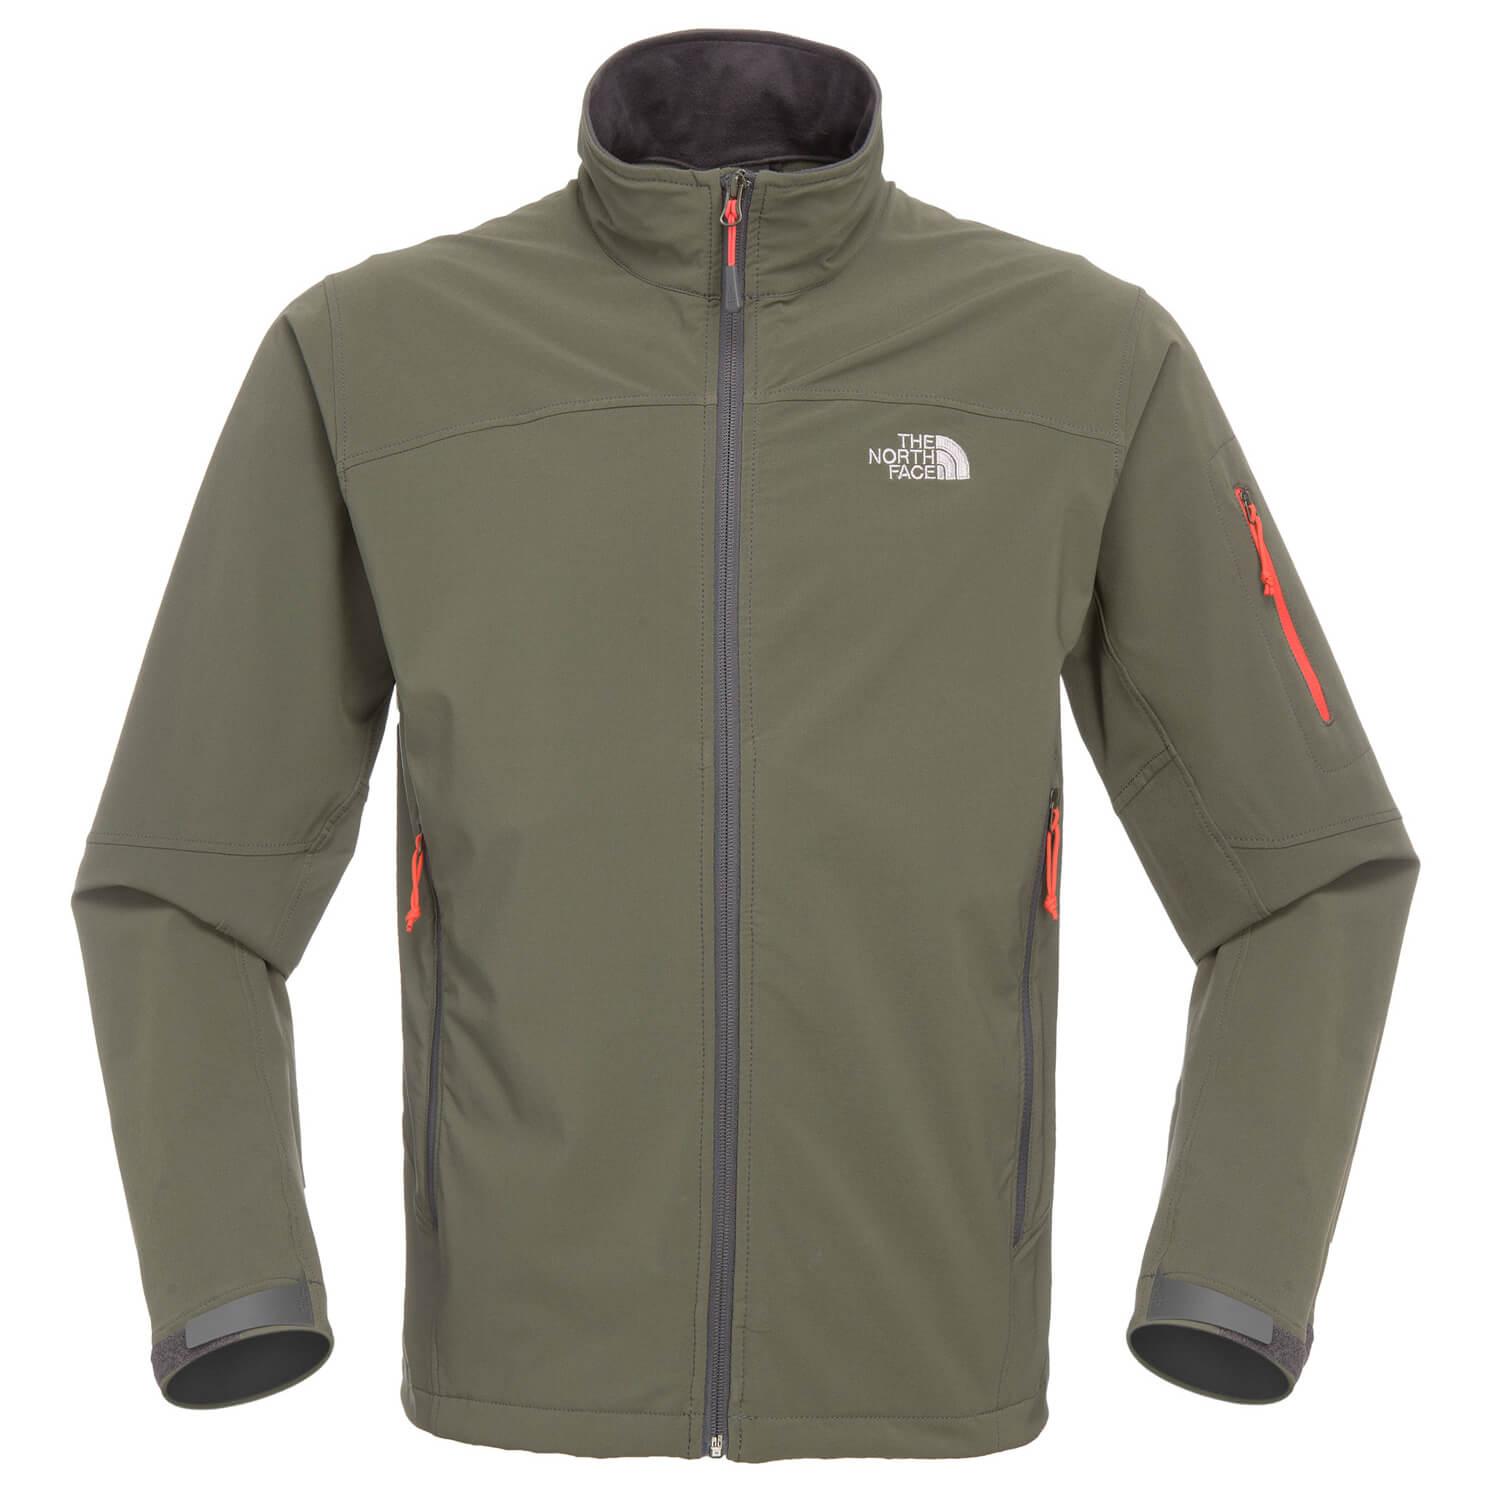 Jacket jacket Ceresio The Softshell North Face PkZTiOXu